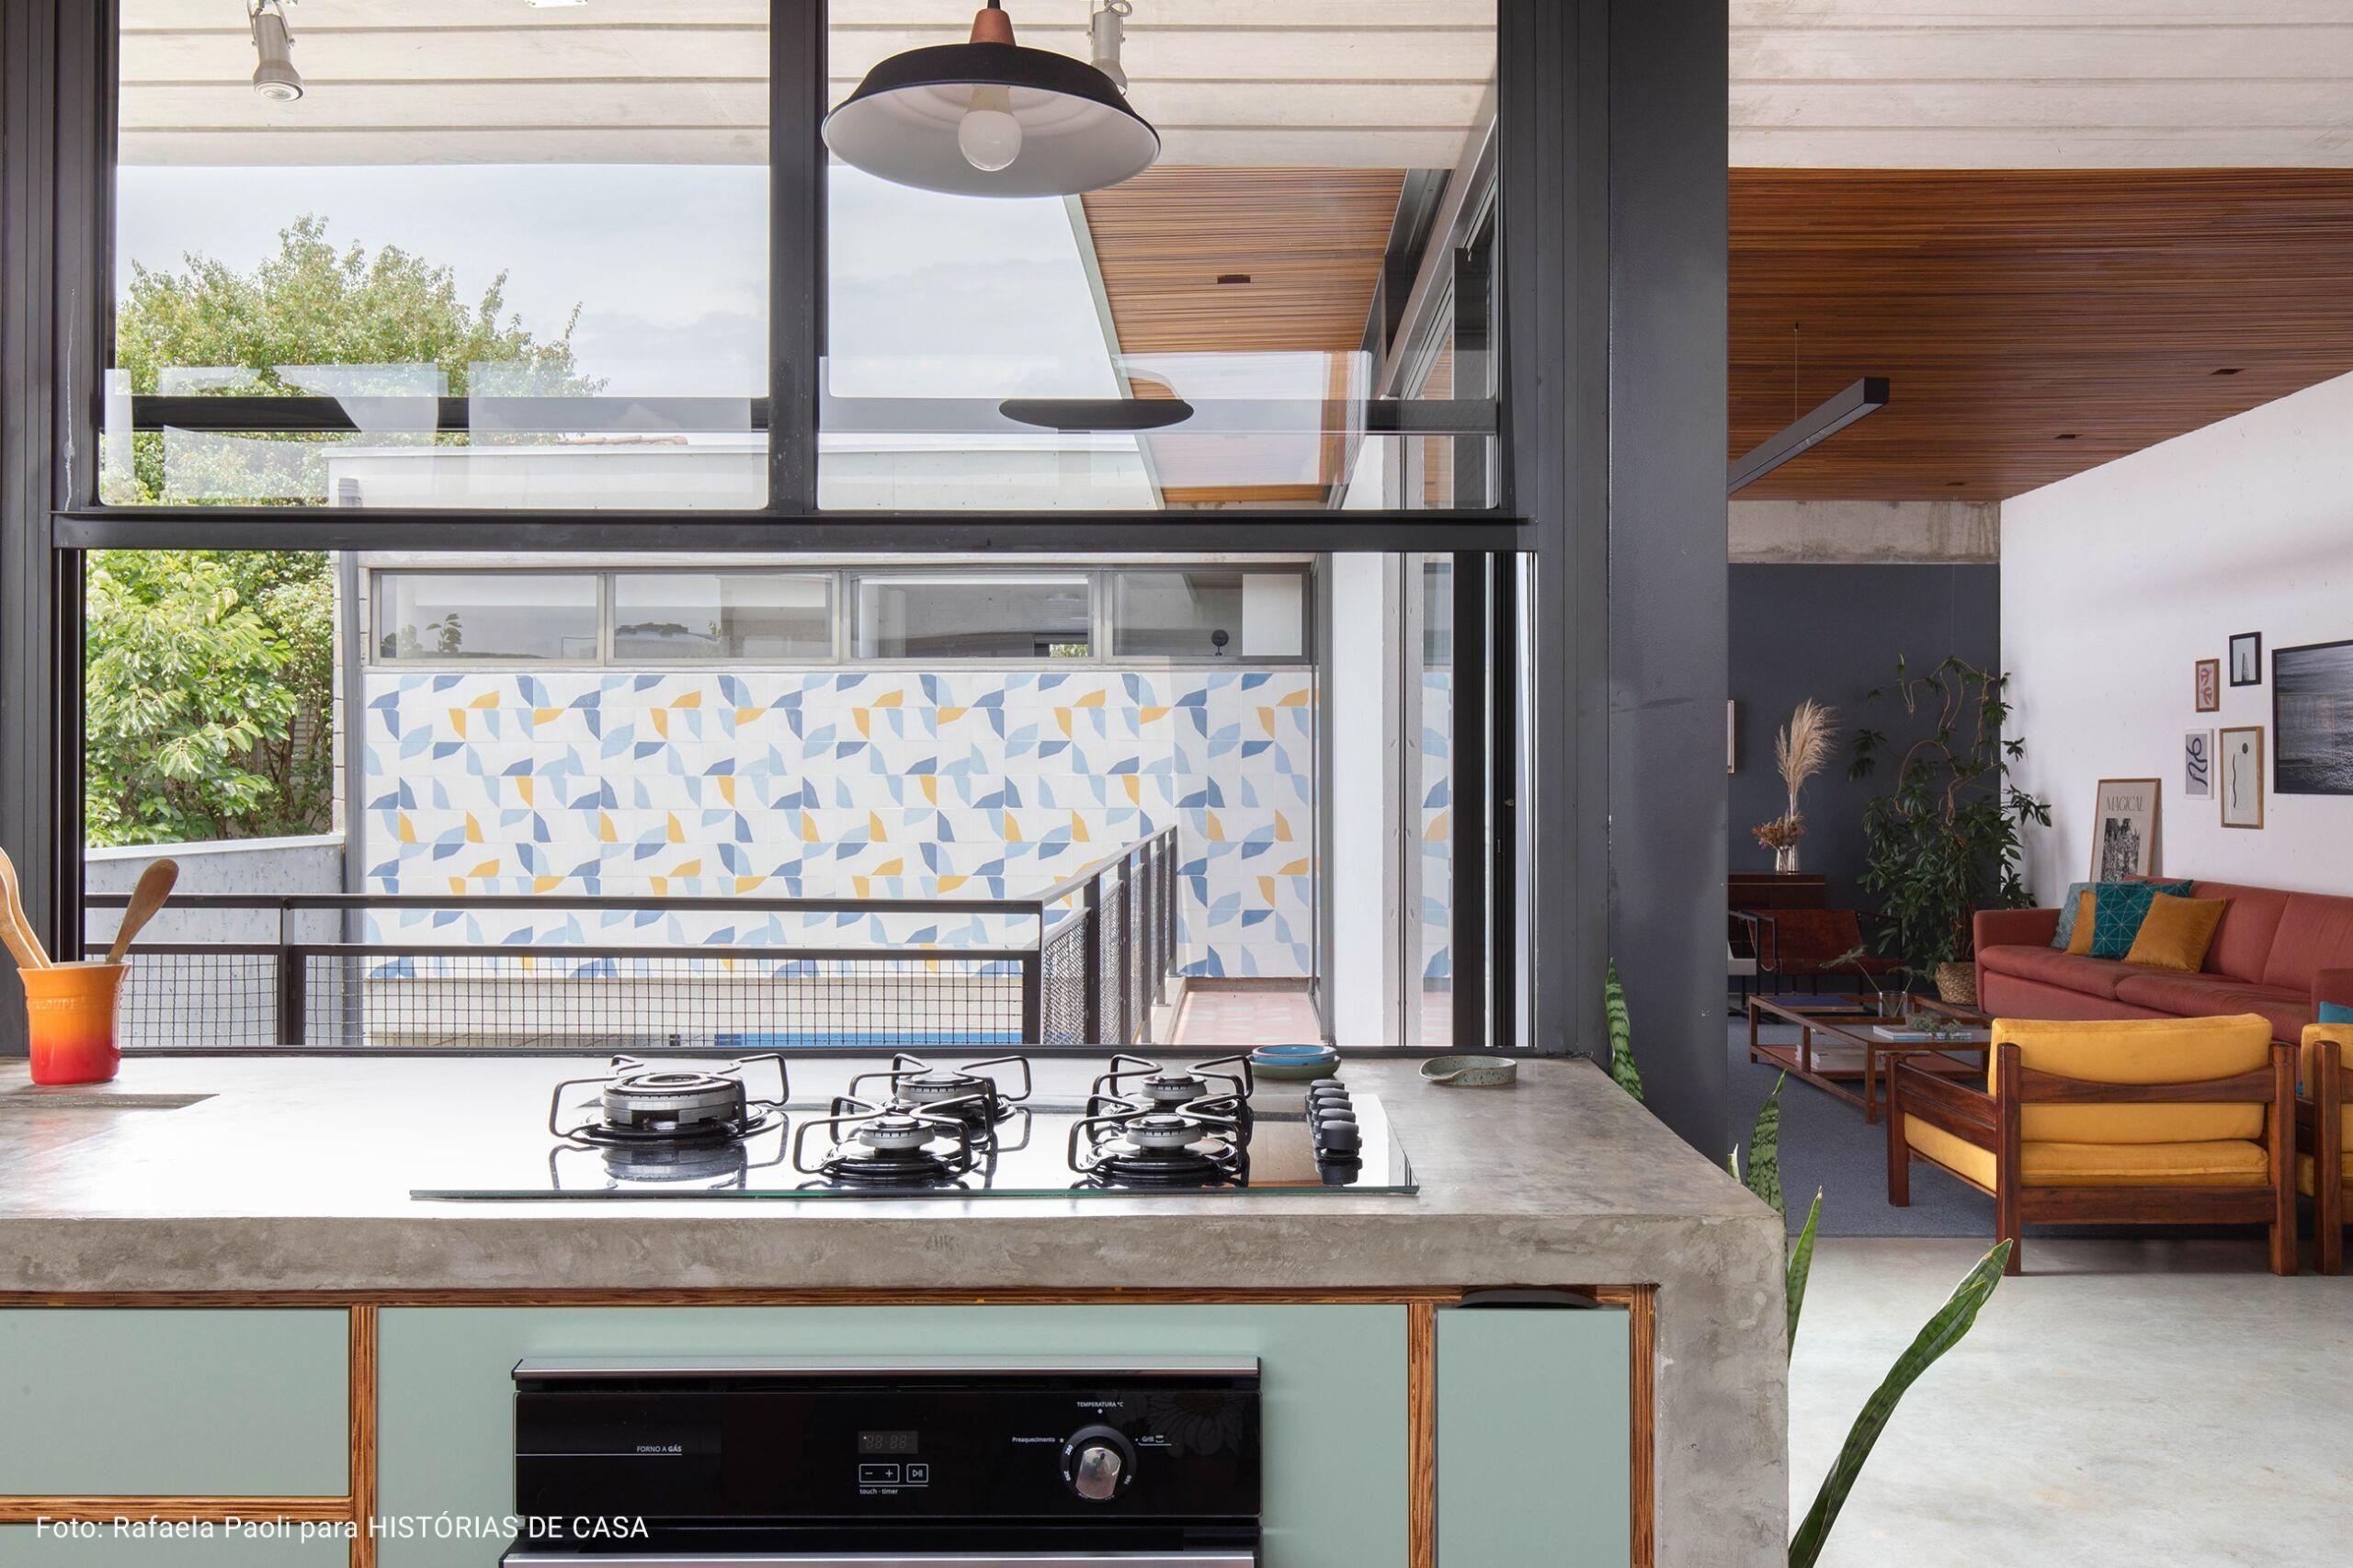 cozinha com cooktop industrial